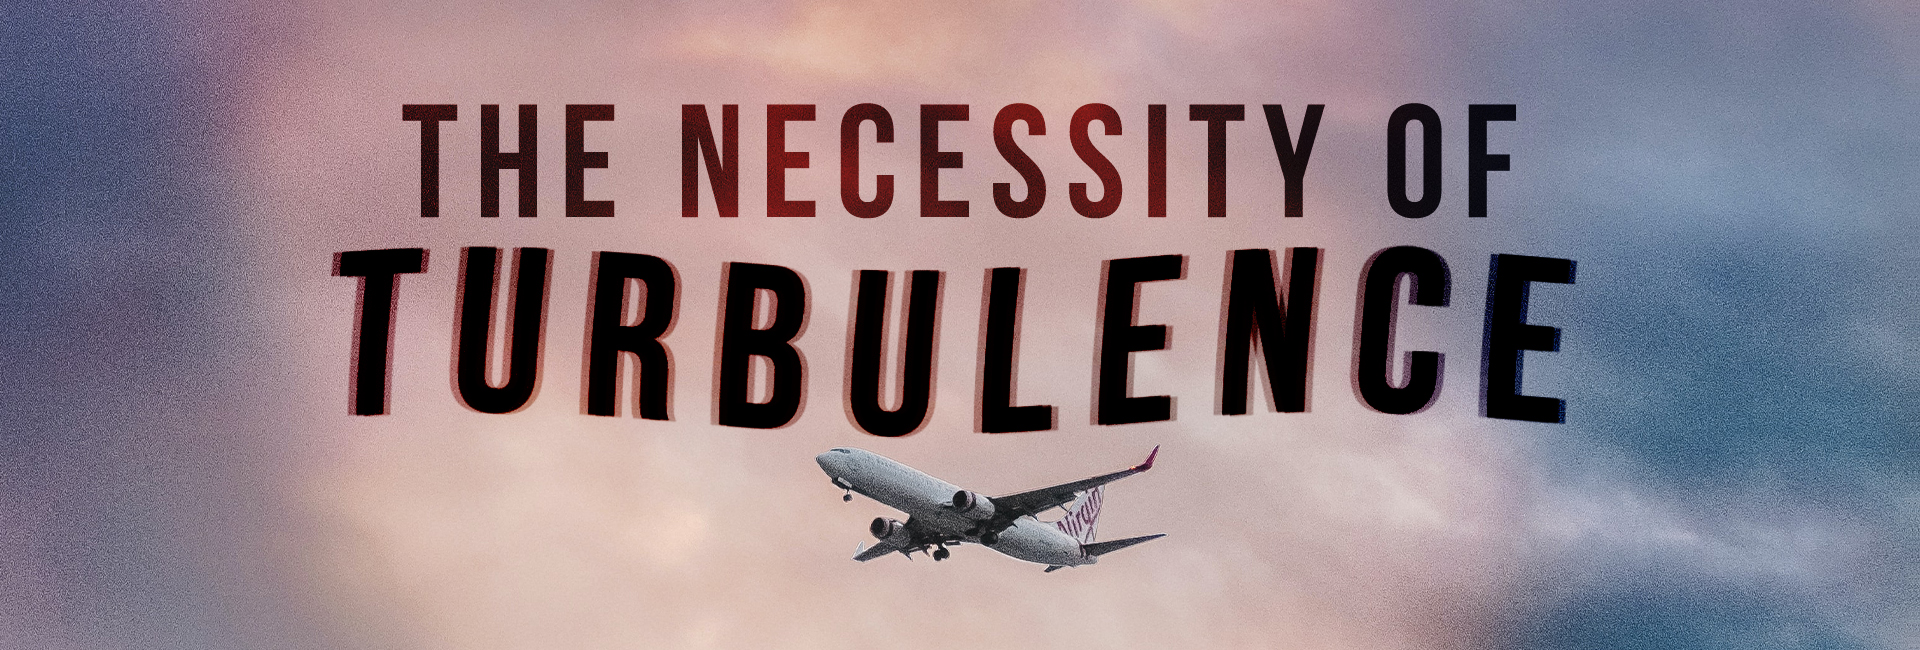 The Necessity of Turbulence